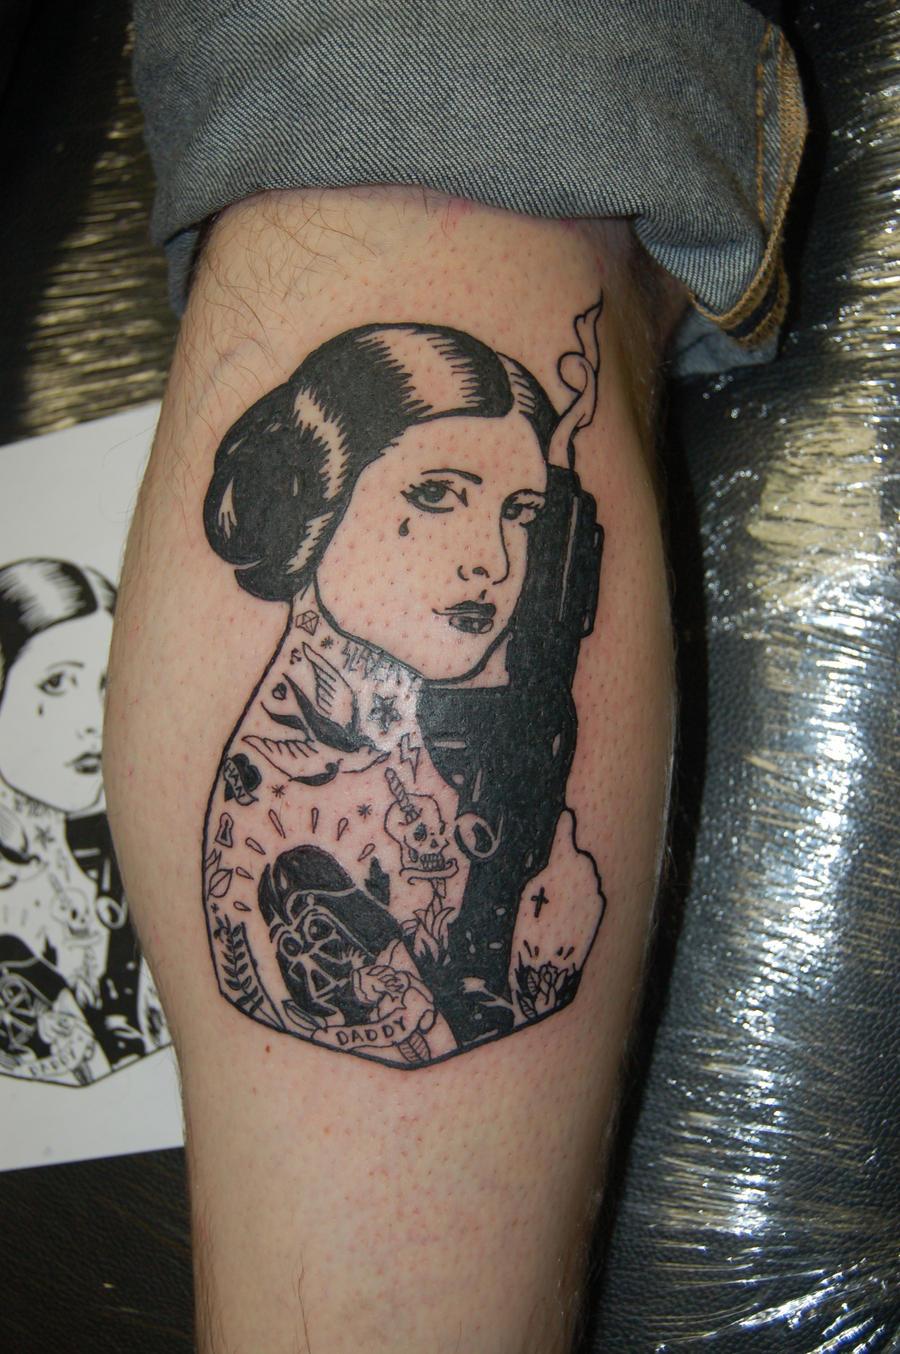 Tattooed Leia Tattoo by yayzus